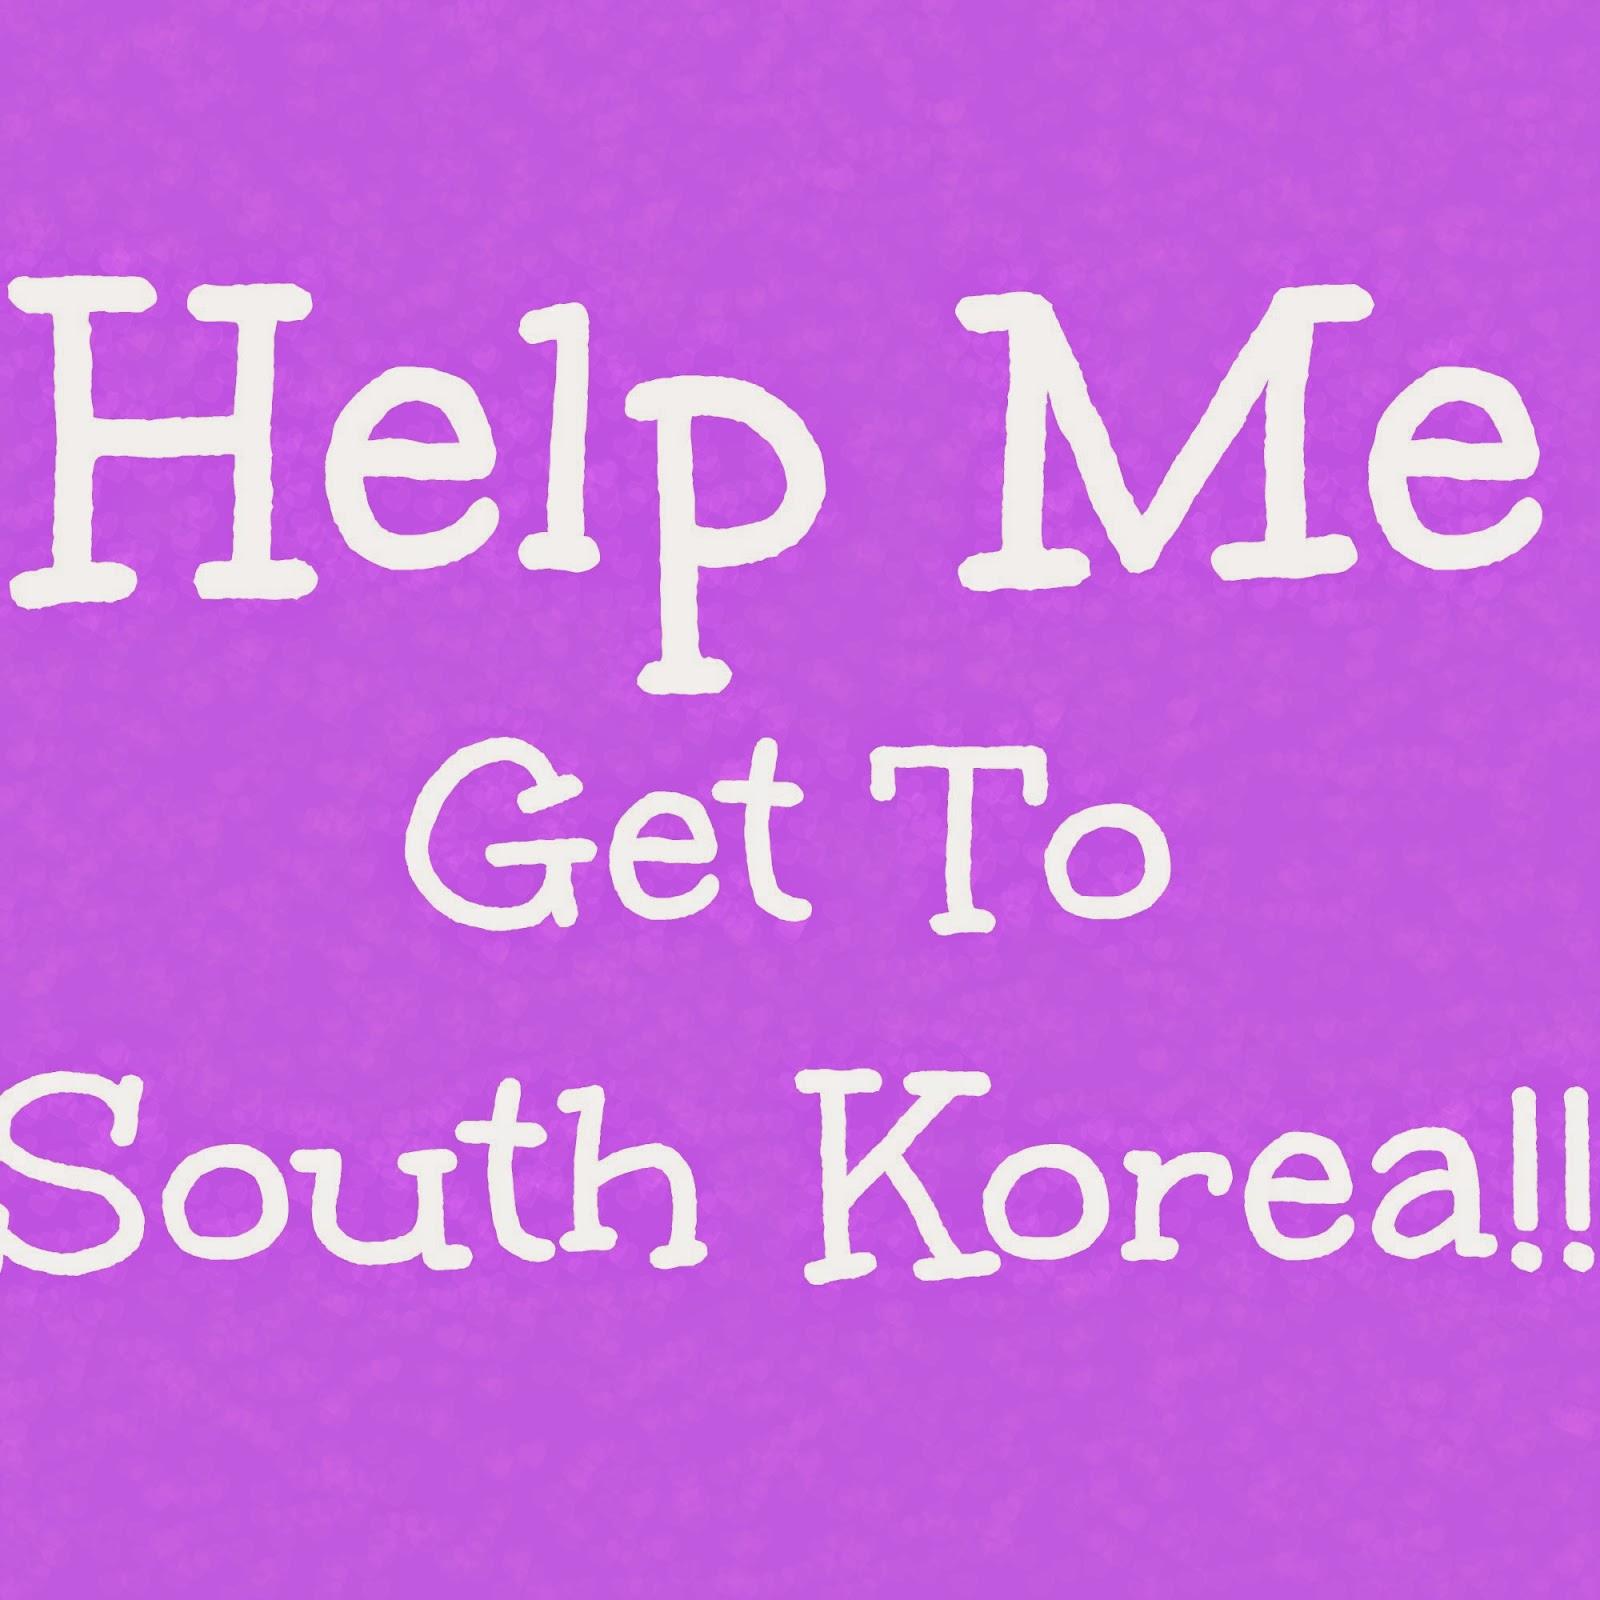 how to say hopefully in korean